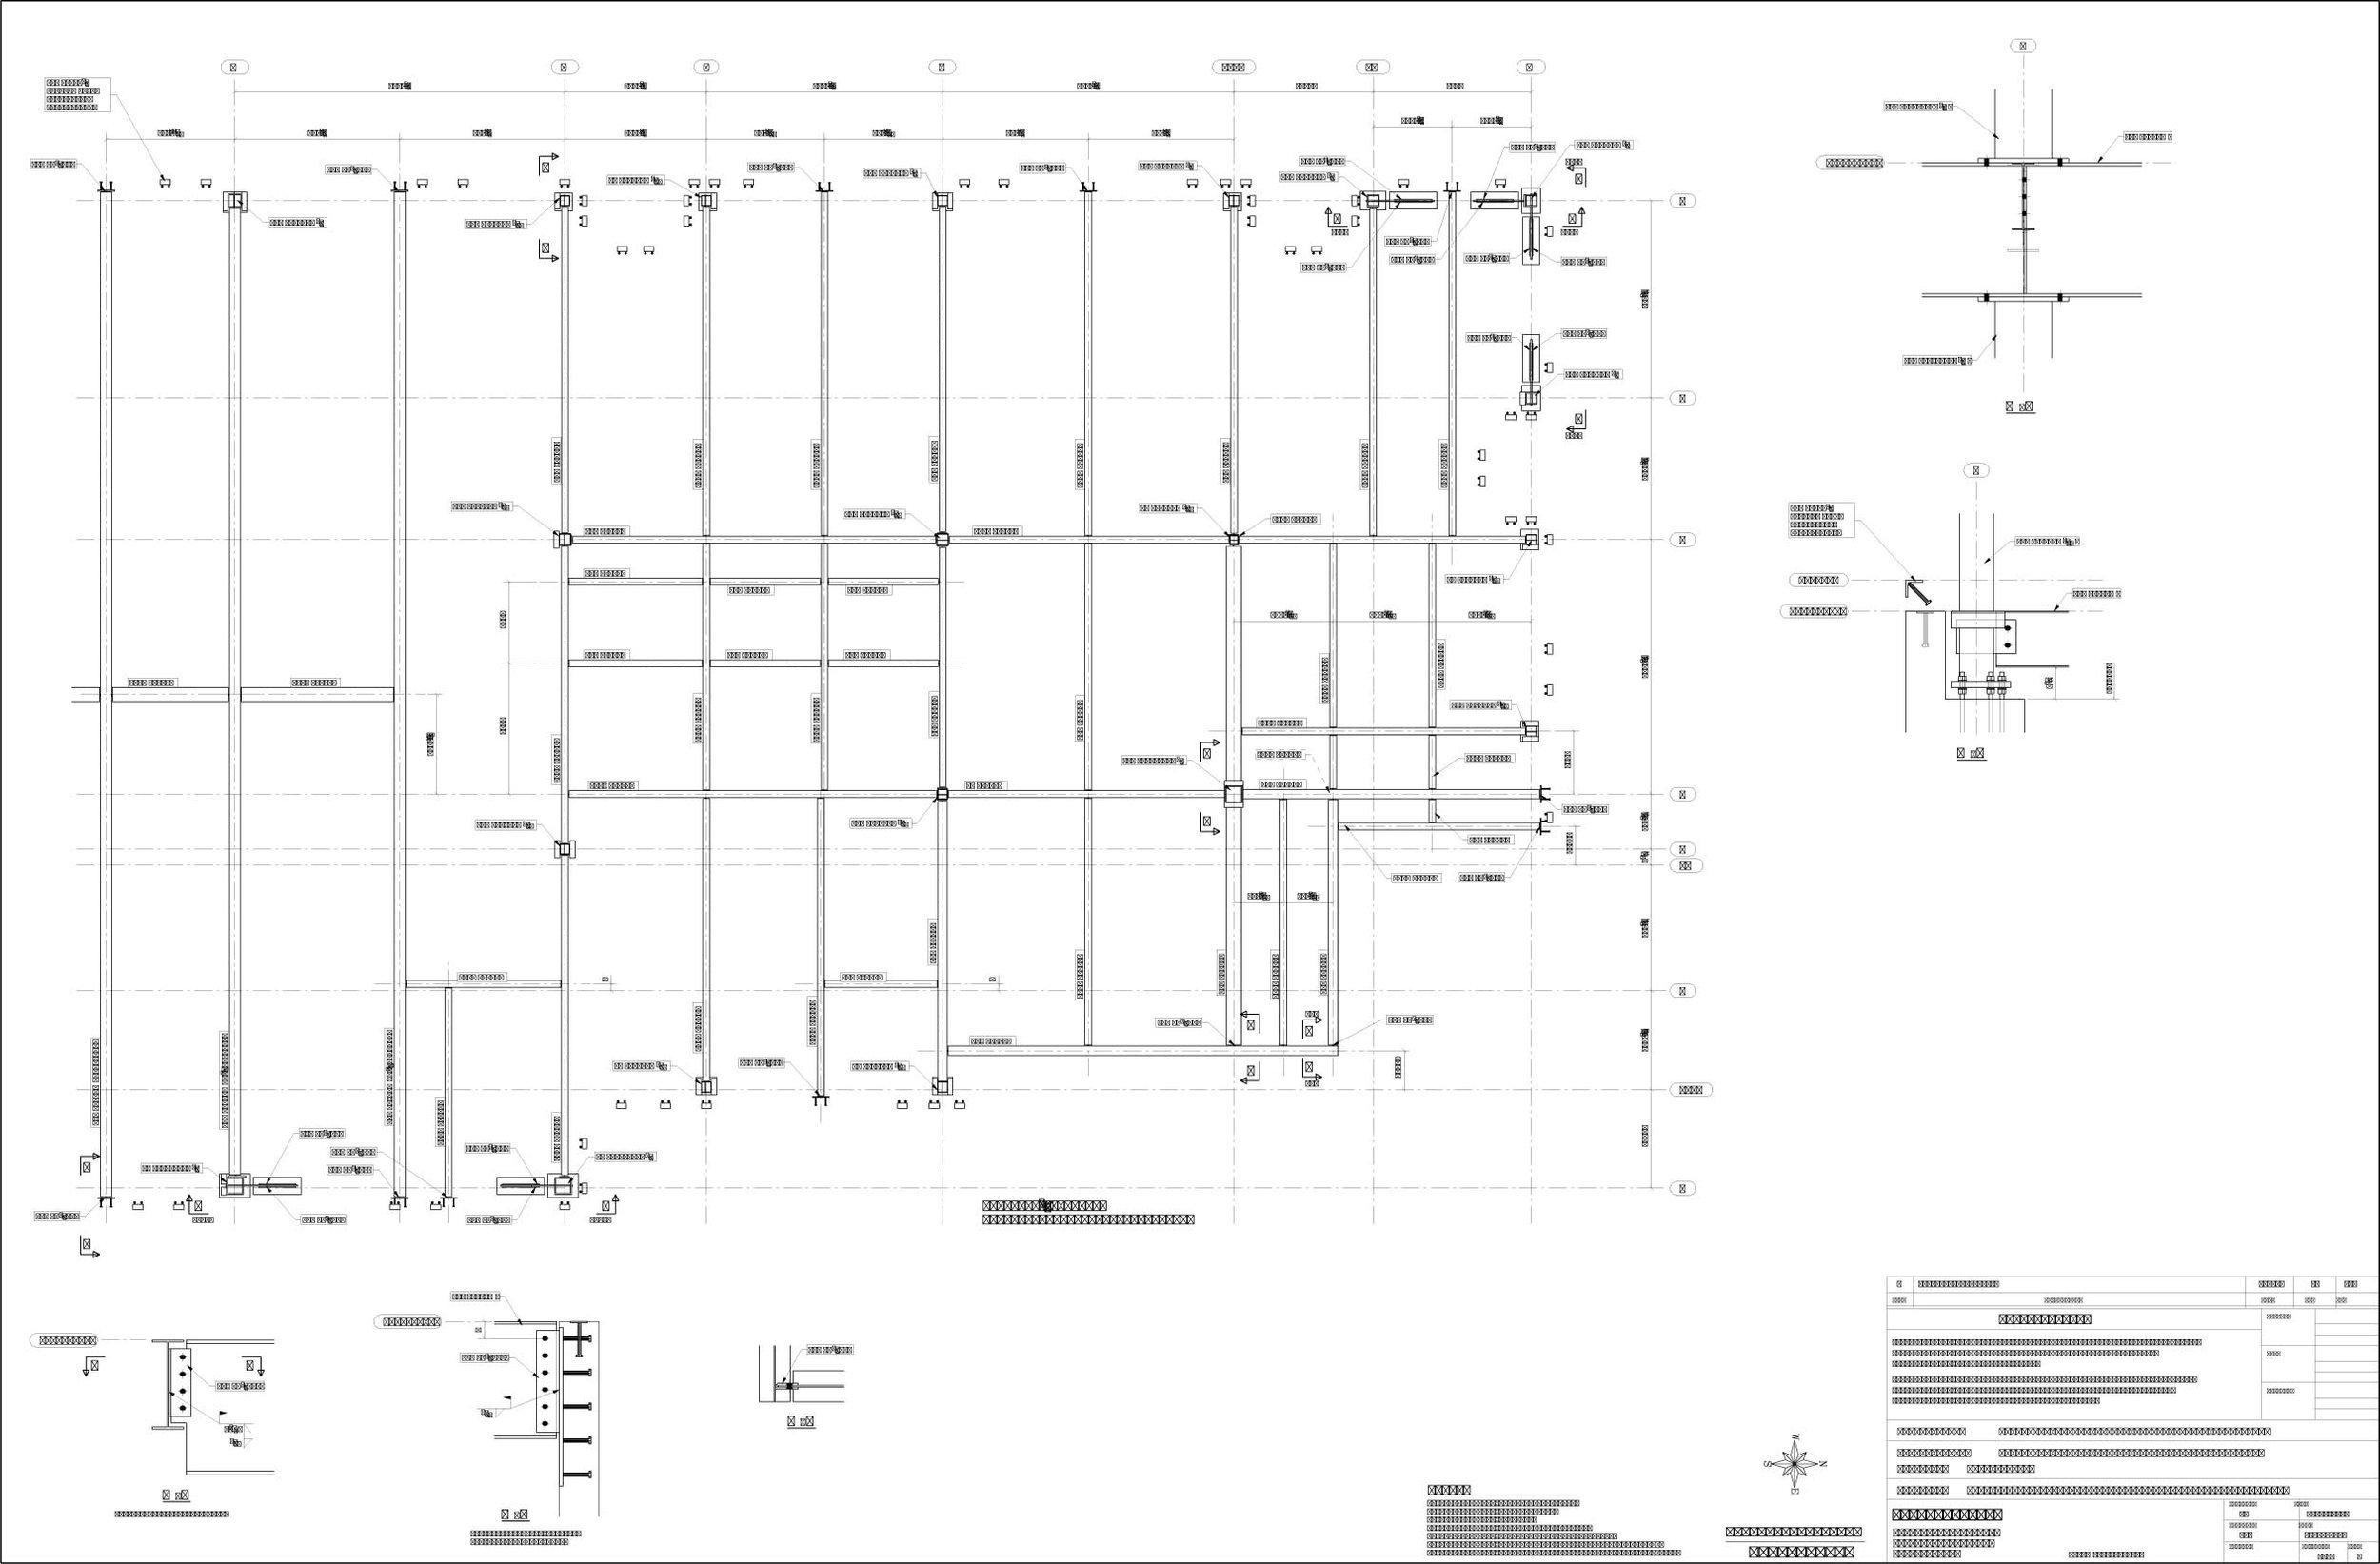 24x36-Placement-Plans-Rev-1-15.jpg